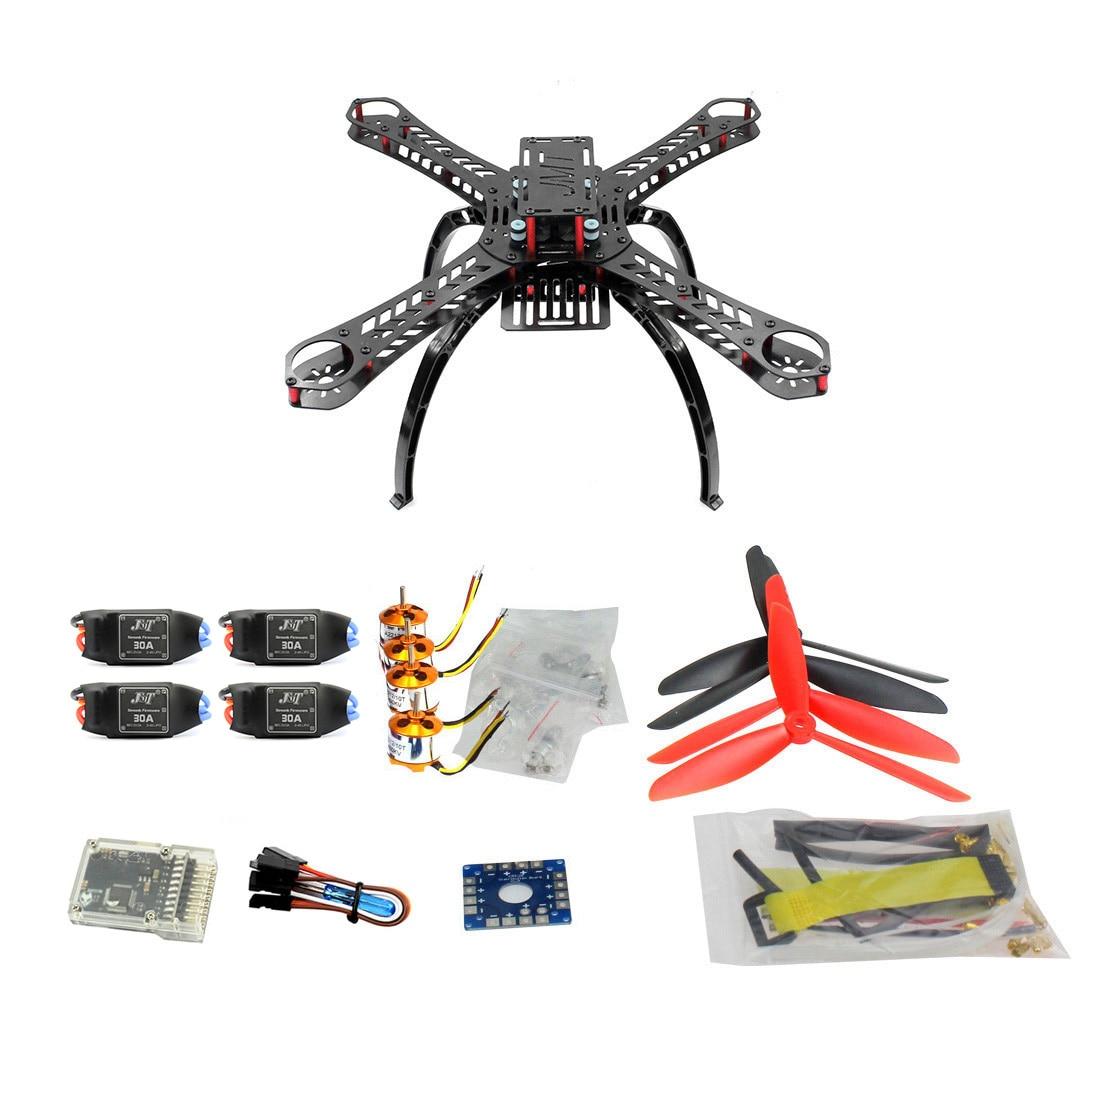 F14891 E DIY BNF Drone Multicopter Kit 310 mm Fiberglass Frame QQ SUPER Multi rotor Flight Control 1400KV Motor 30A ESC